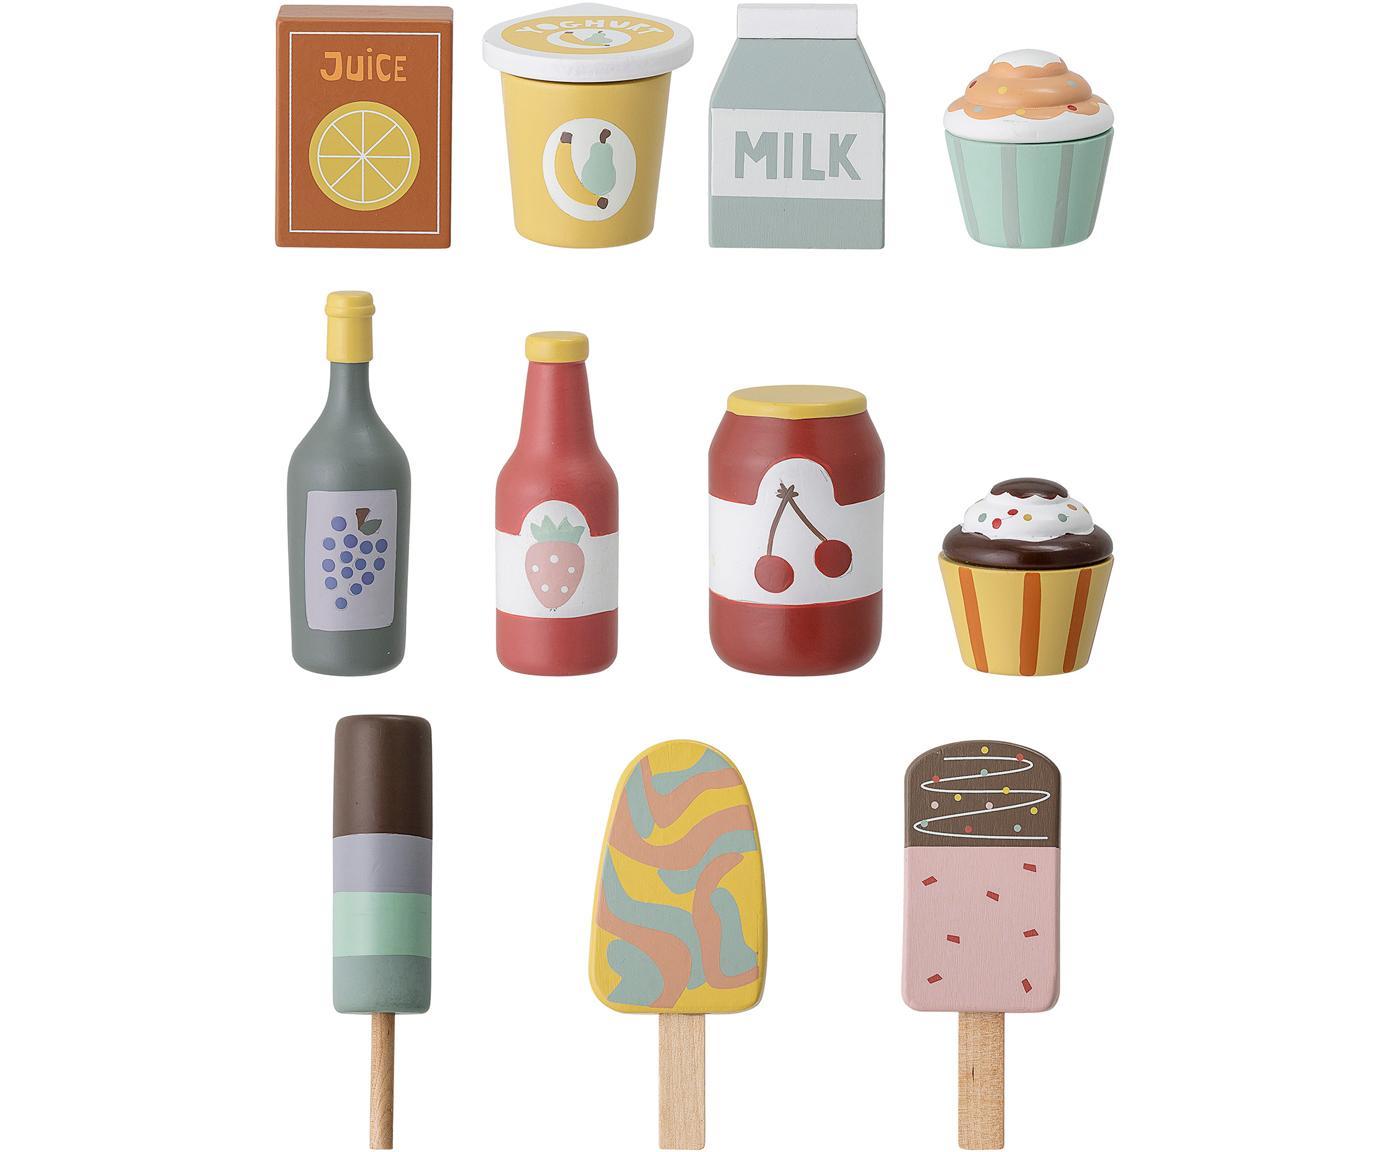 Set de juguetes Food, Madera de loto, tablero de fibras de densidad media (MDF), Multicolor, An 6 x Al 10 cm